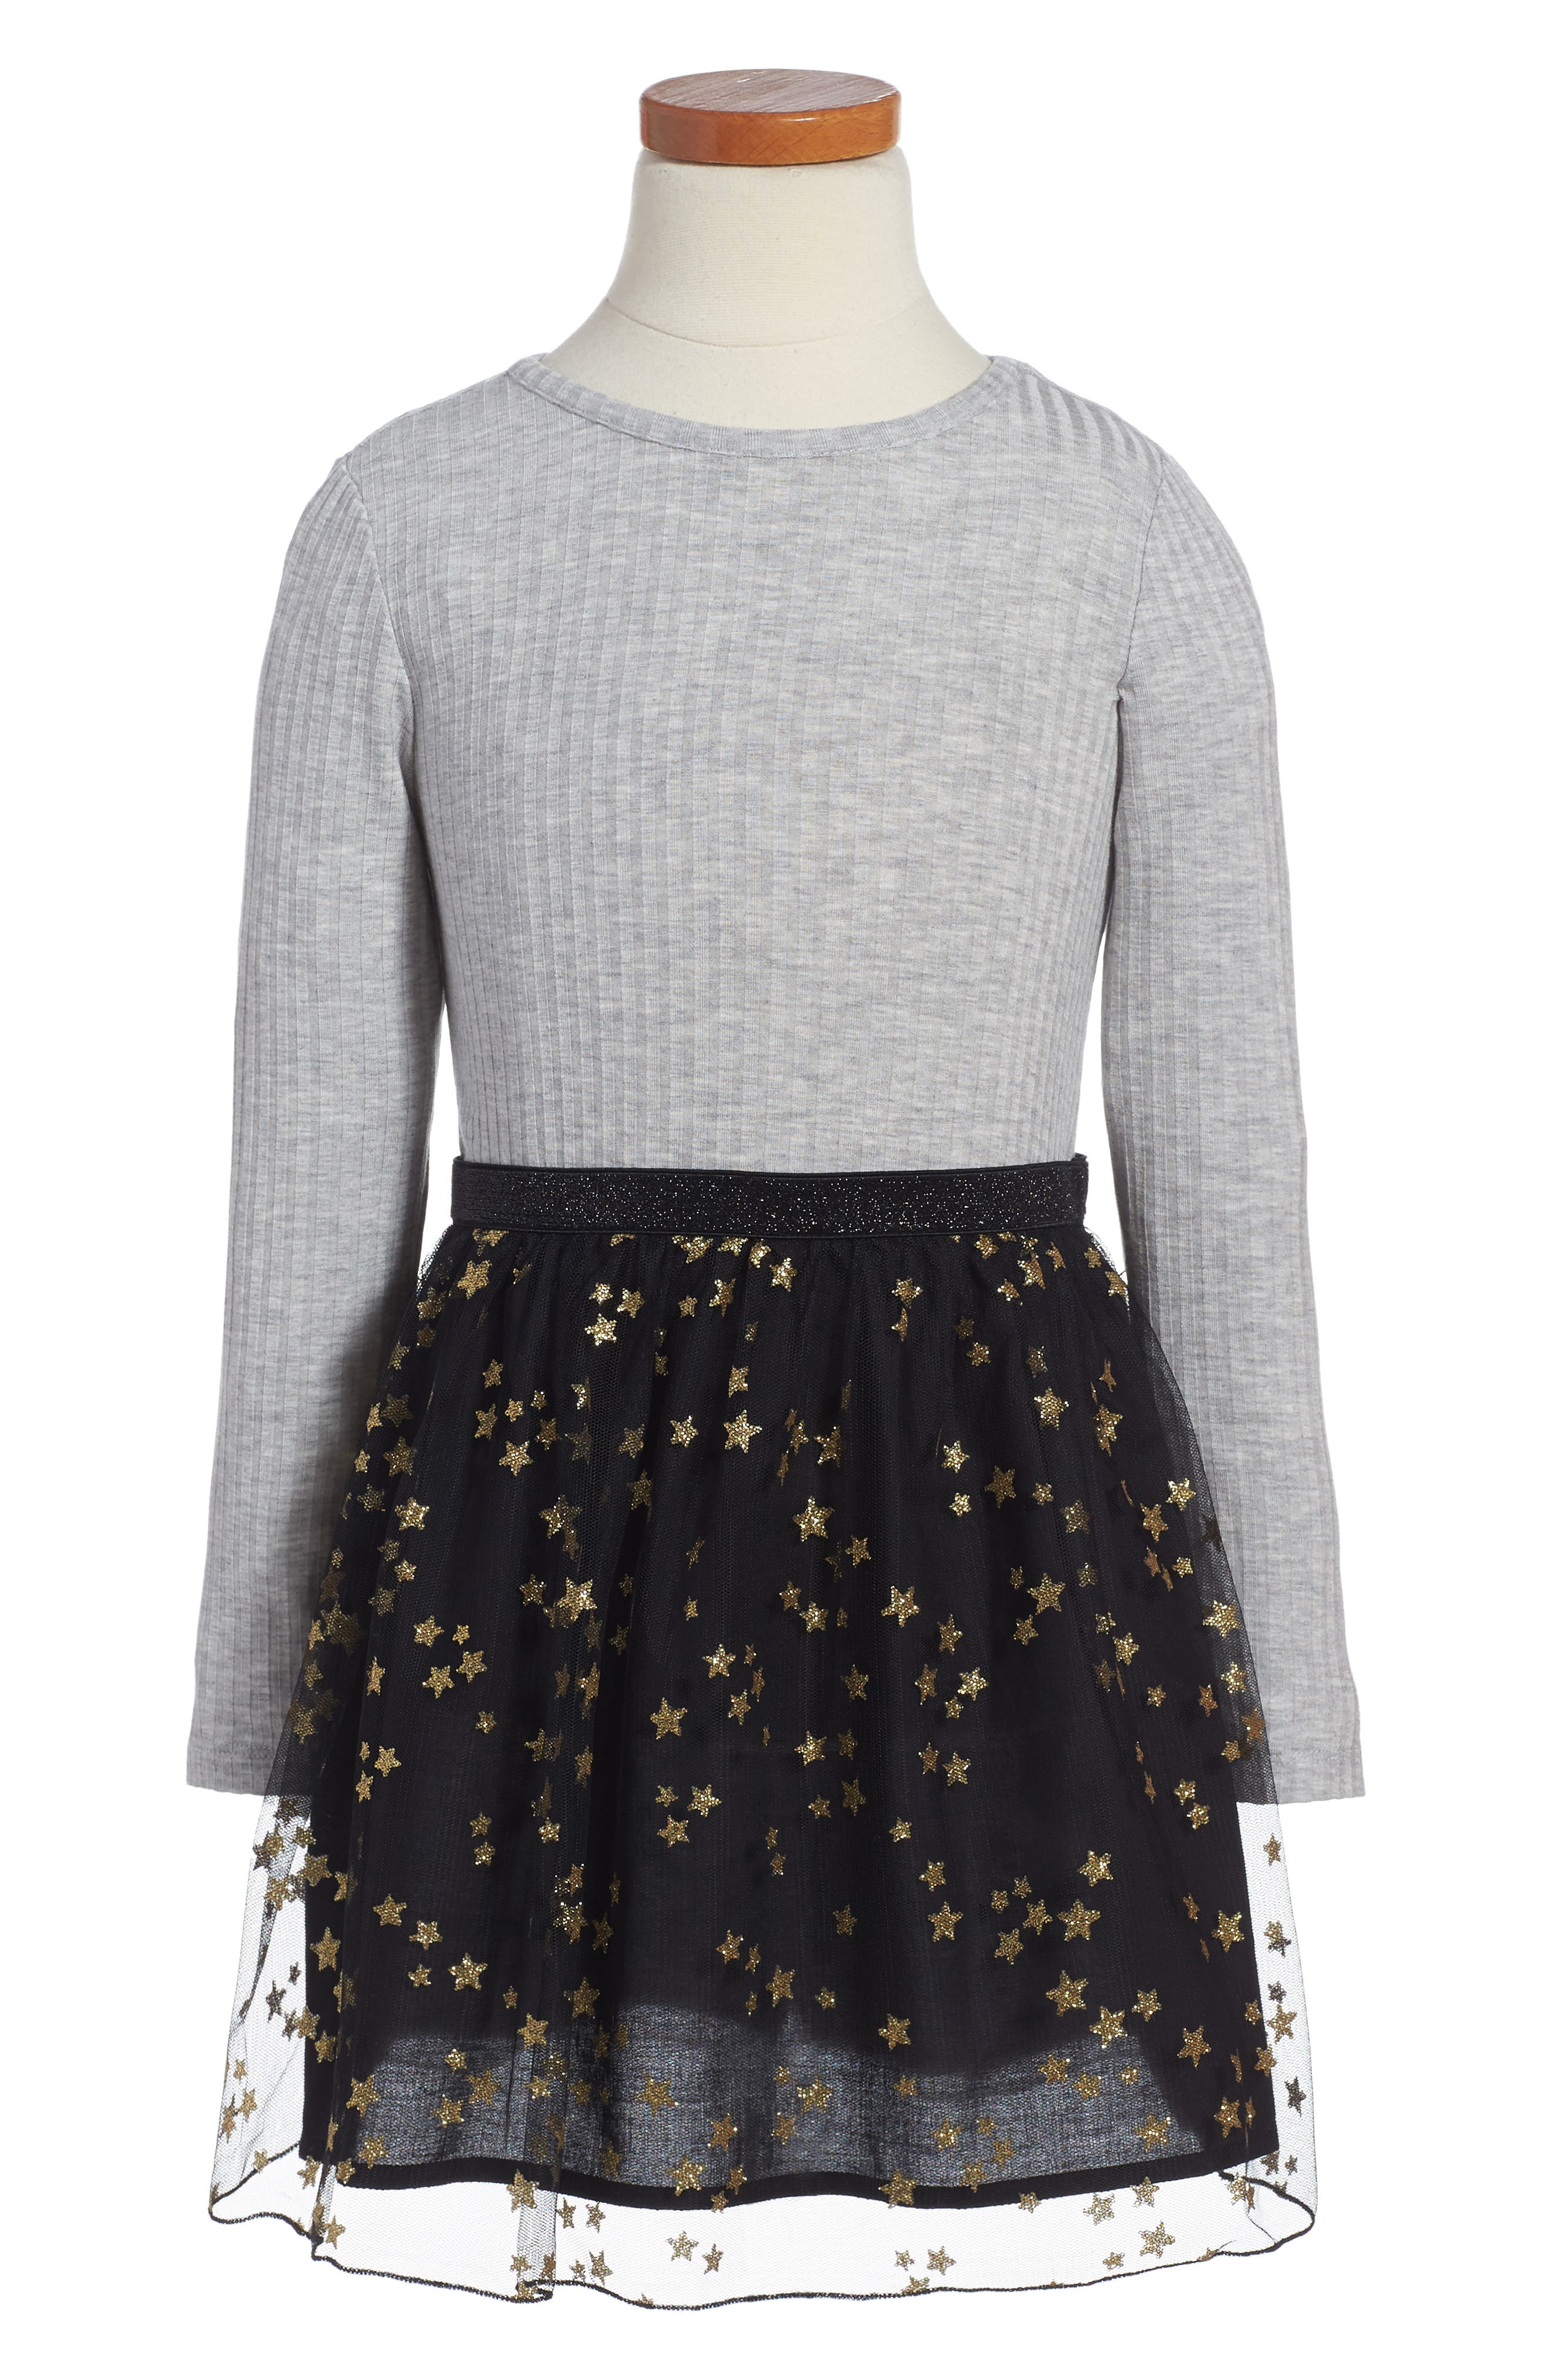 c59aedb0026f Burberry Dawny Check Print Sleeveless Dress (Toddler Girls)   Nordstrom